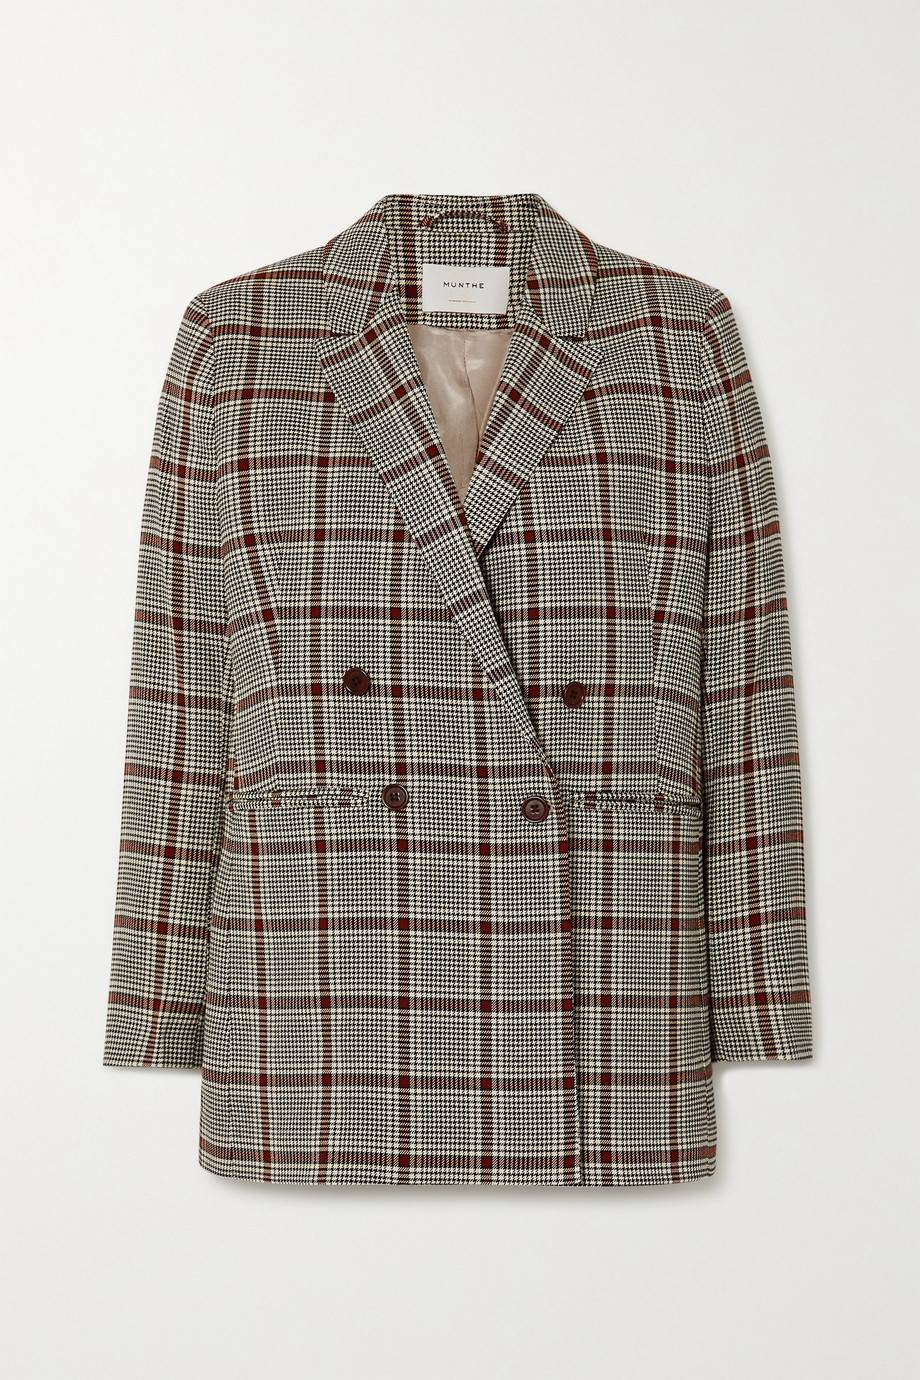 MUNTHE Lyle 双排扣梭织西装外套